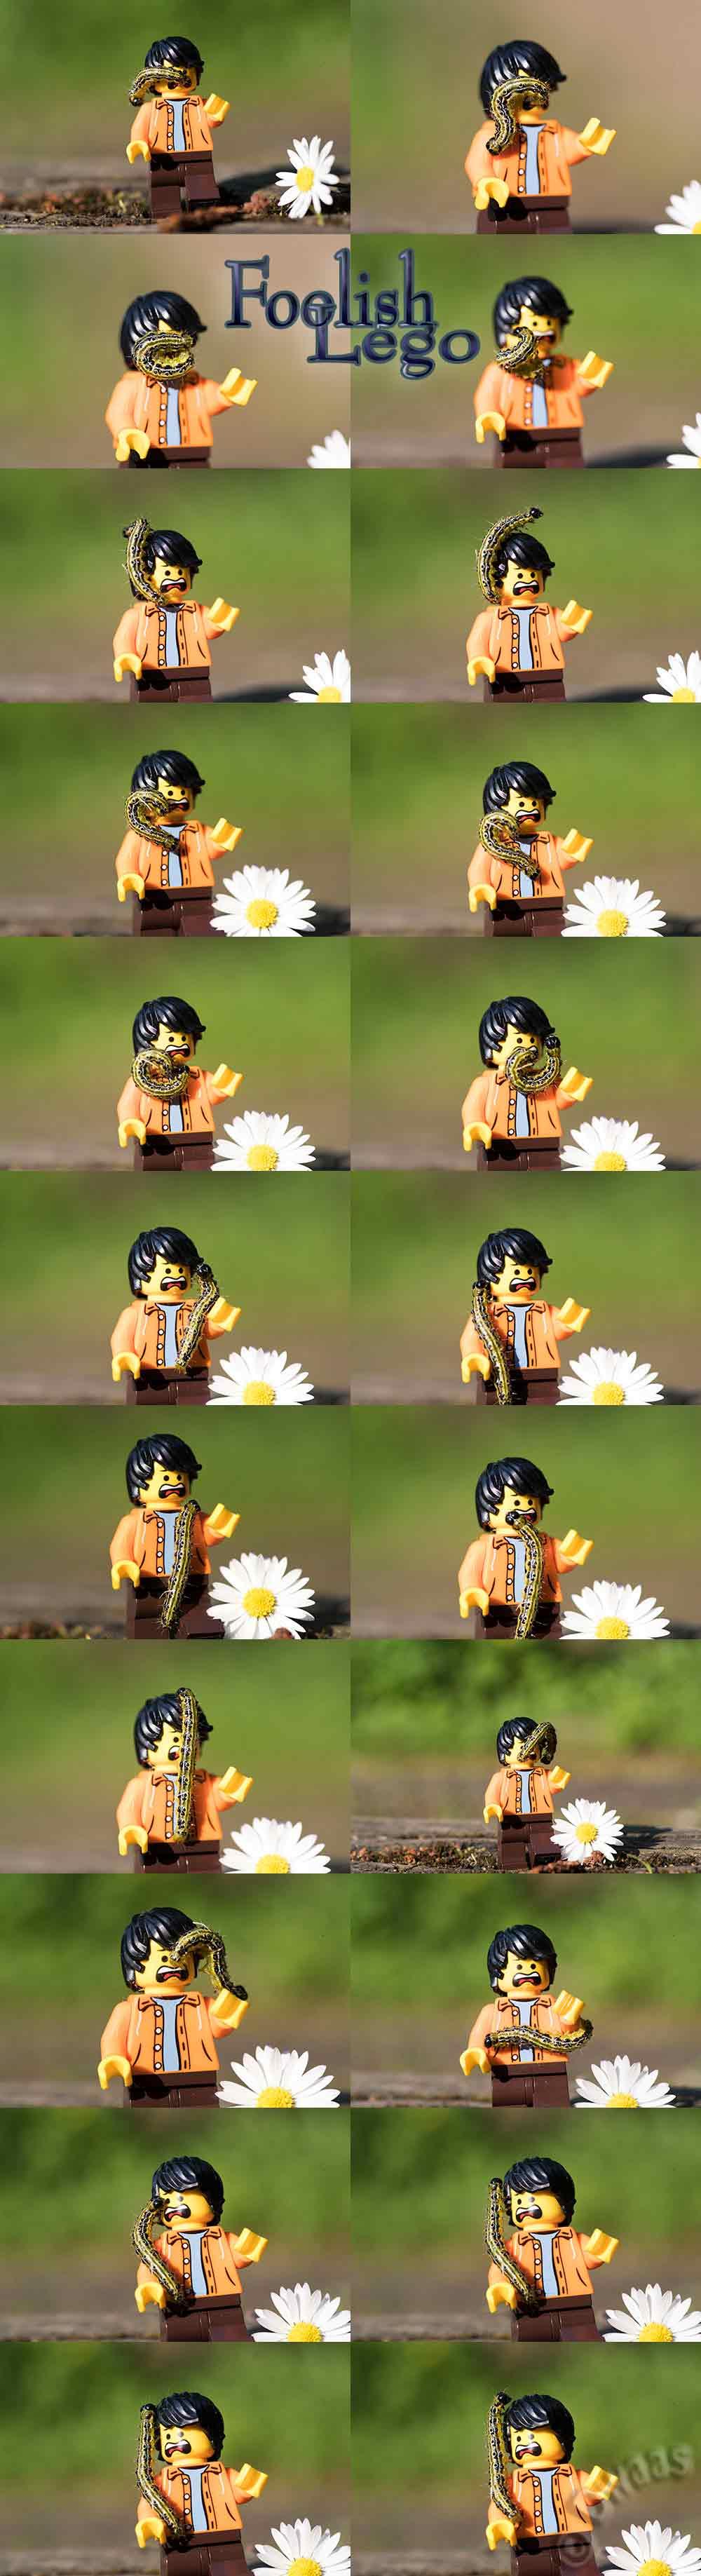 set of photos showing man with caterpillar on him